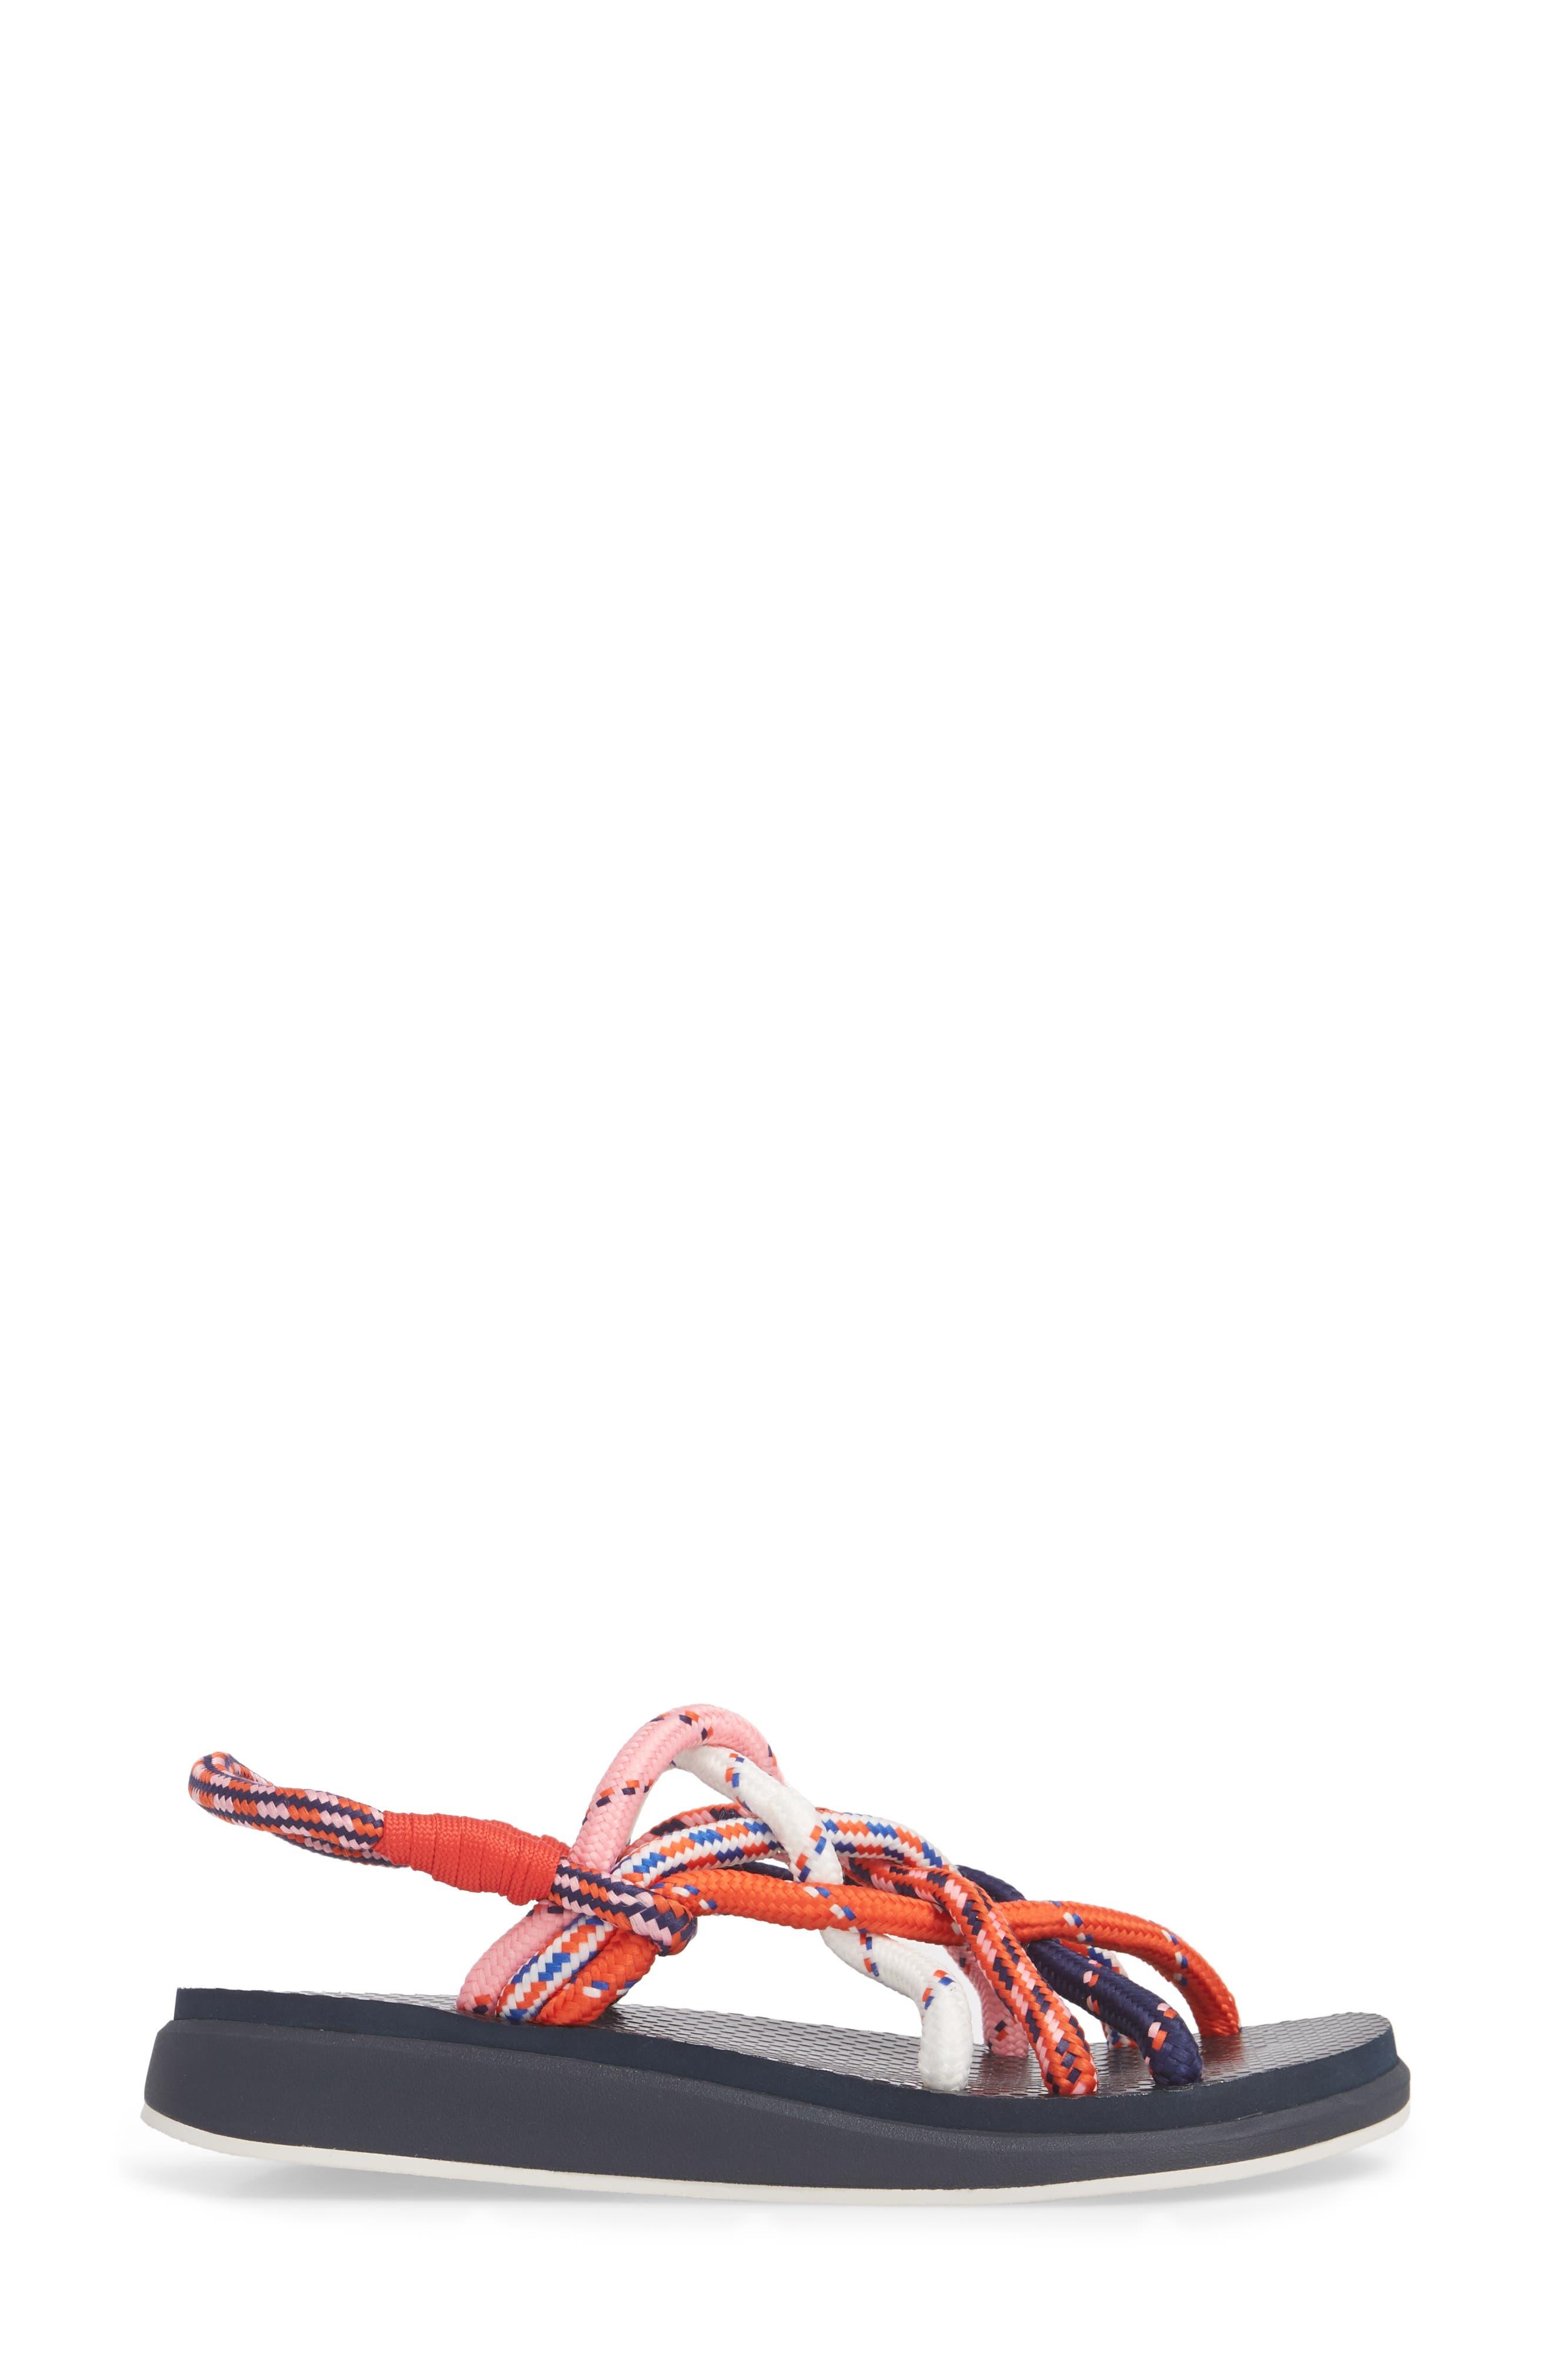 Rope Sandal,                             Alternate thumbnail 3, color,                             643